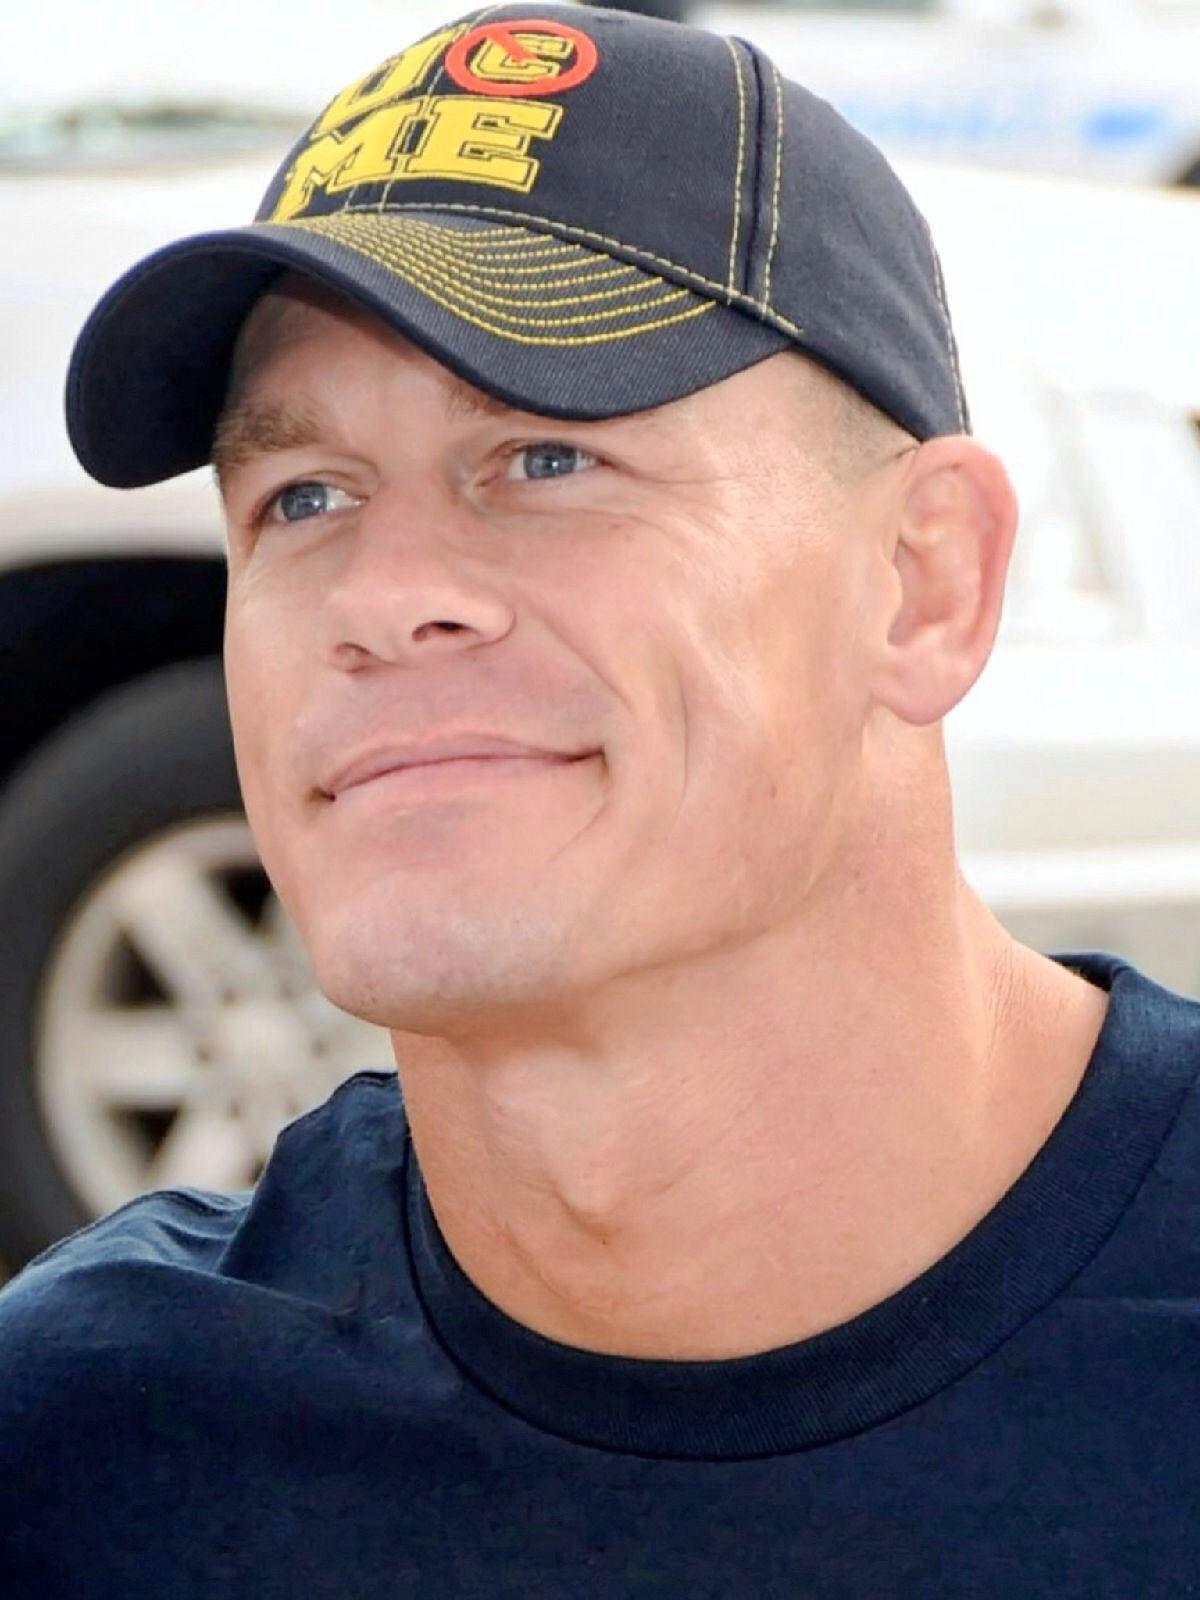 Photo of John Cena: American professional wrestler, bodybuilder, rapper, and actor